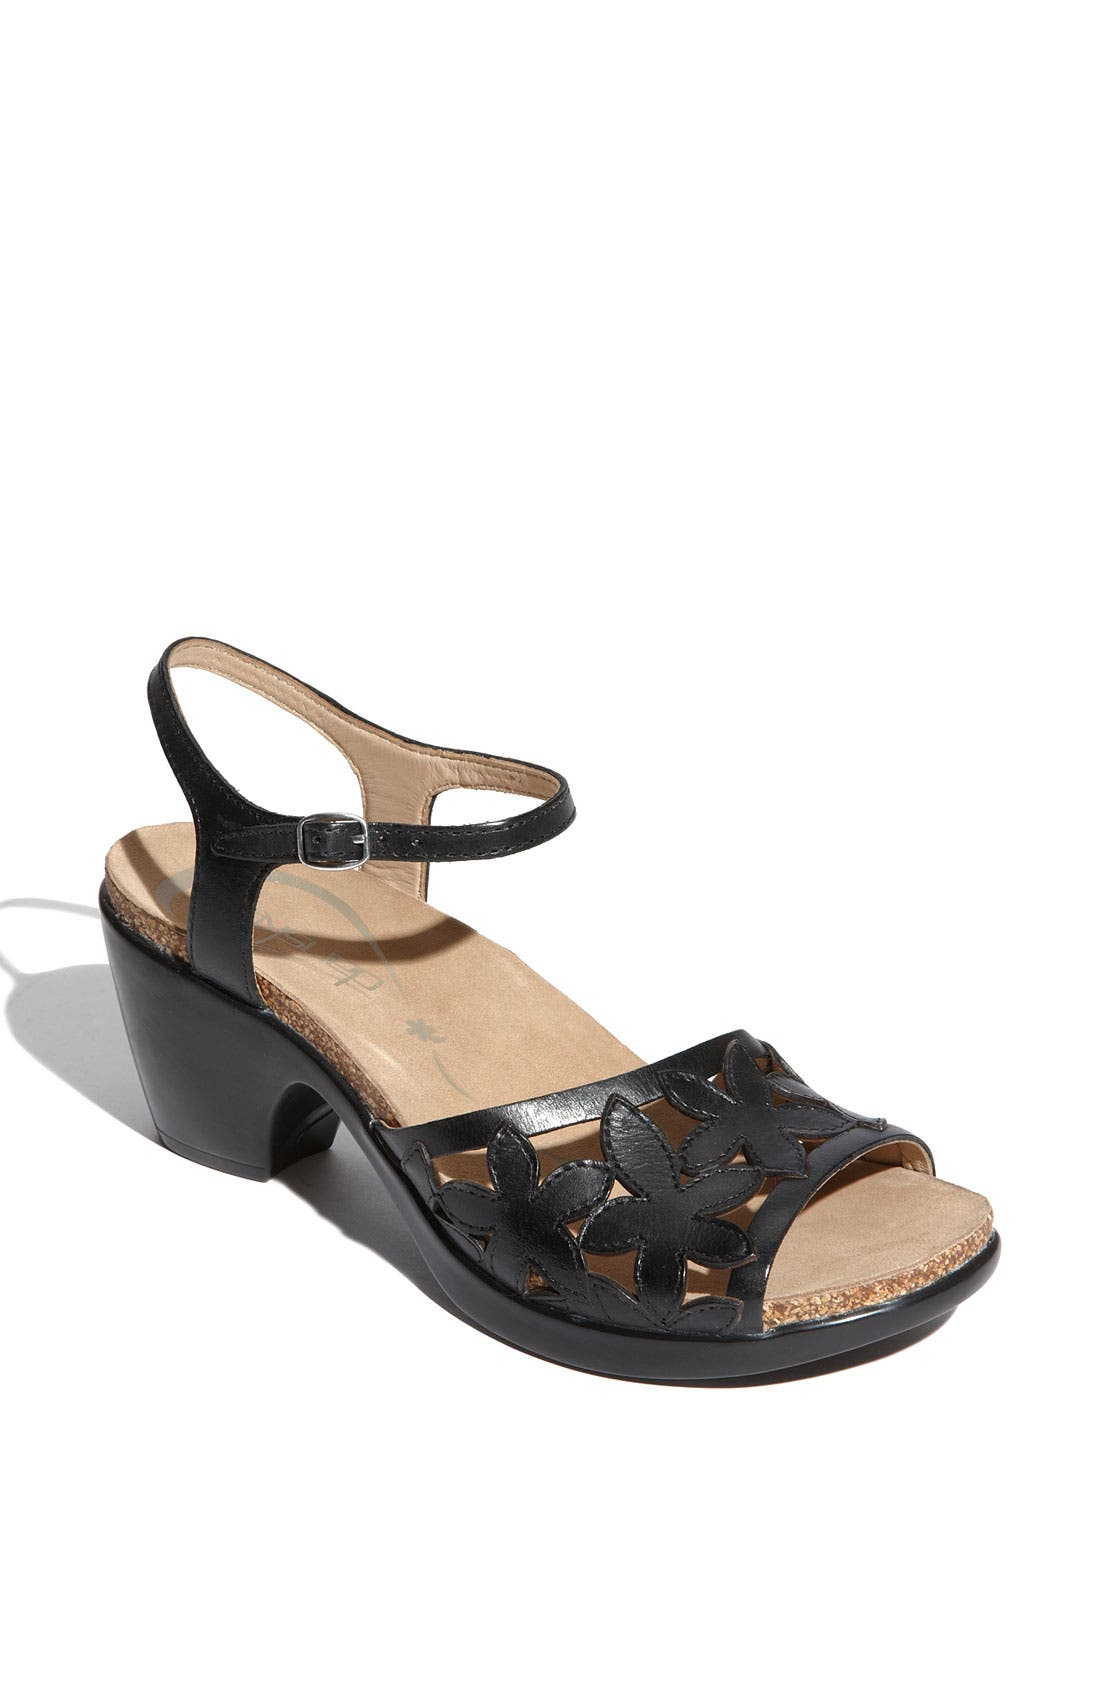 DANSKO 'Coquette' Sandal, Main, color, 001